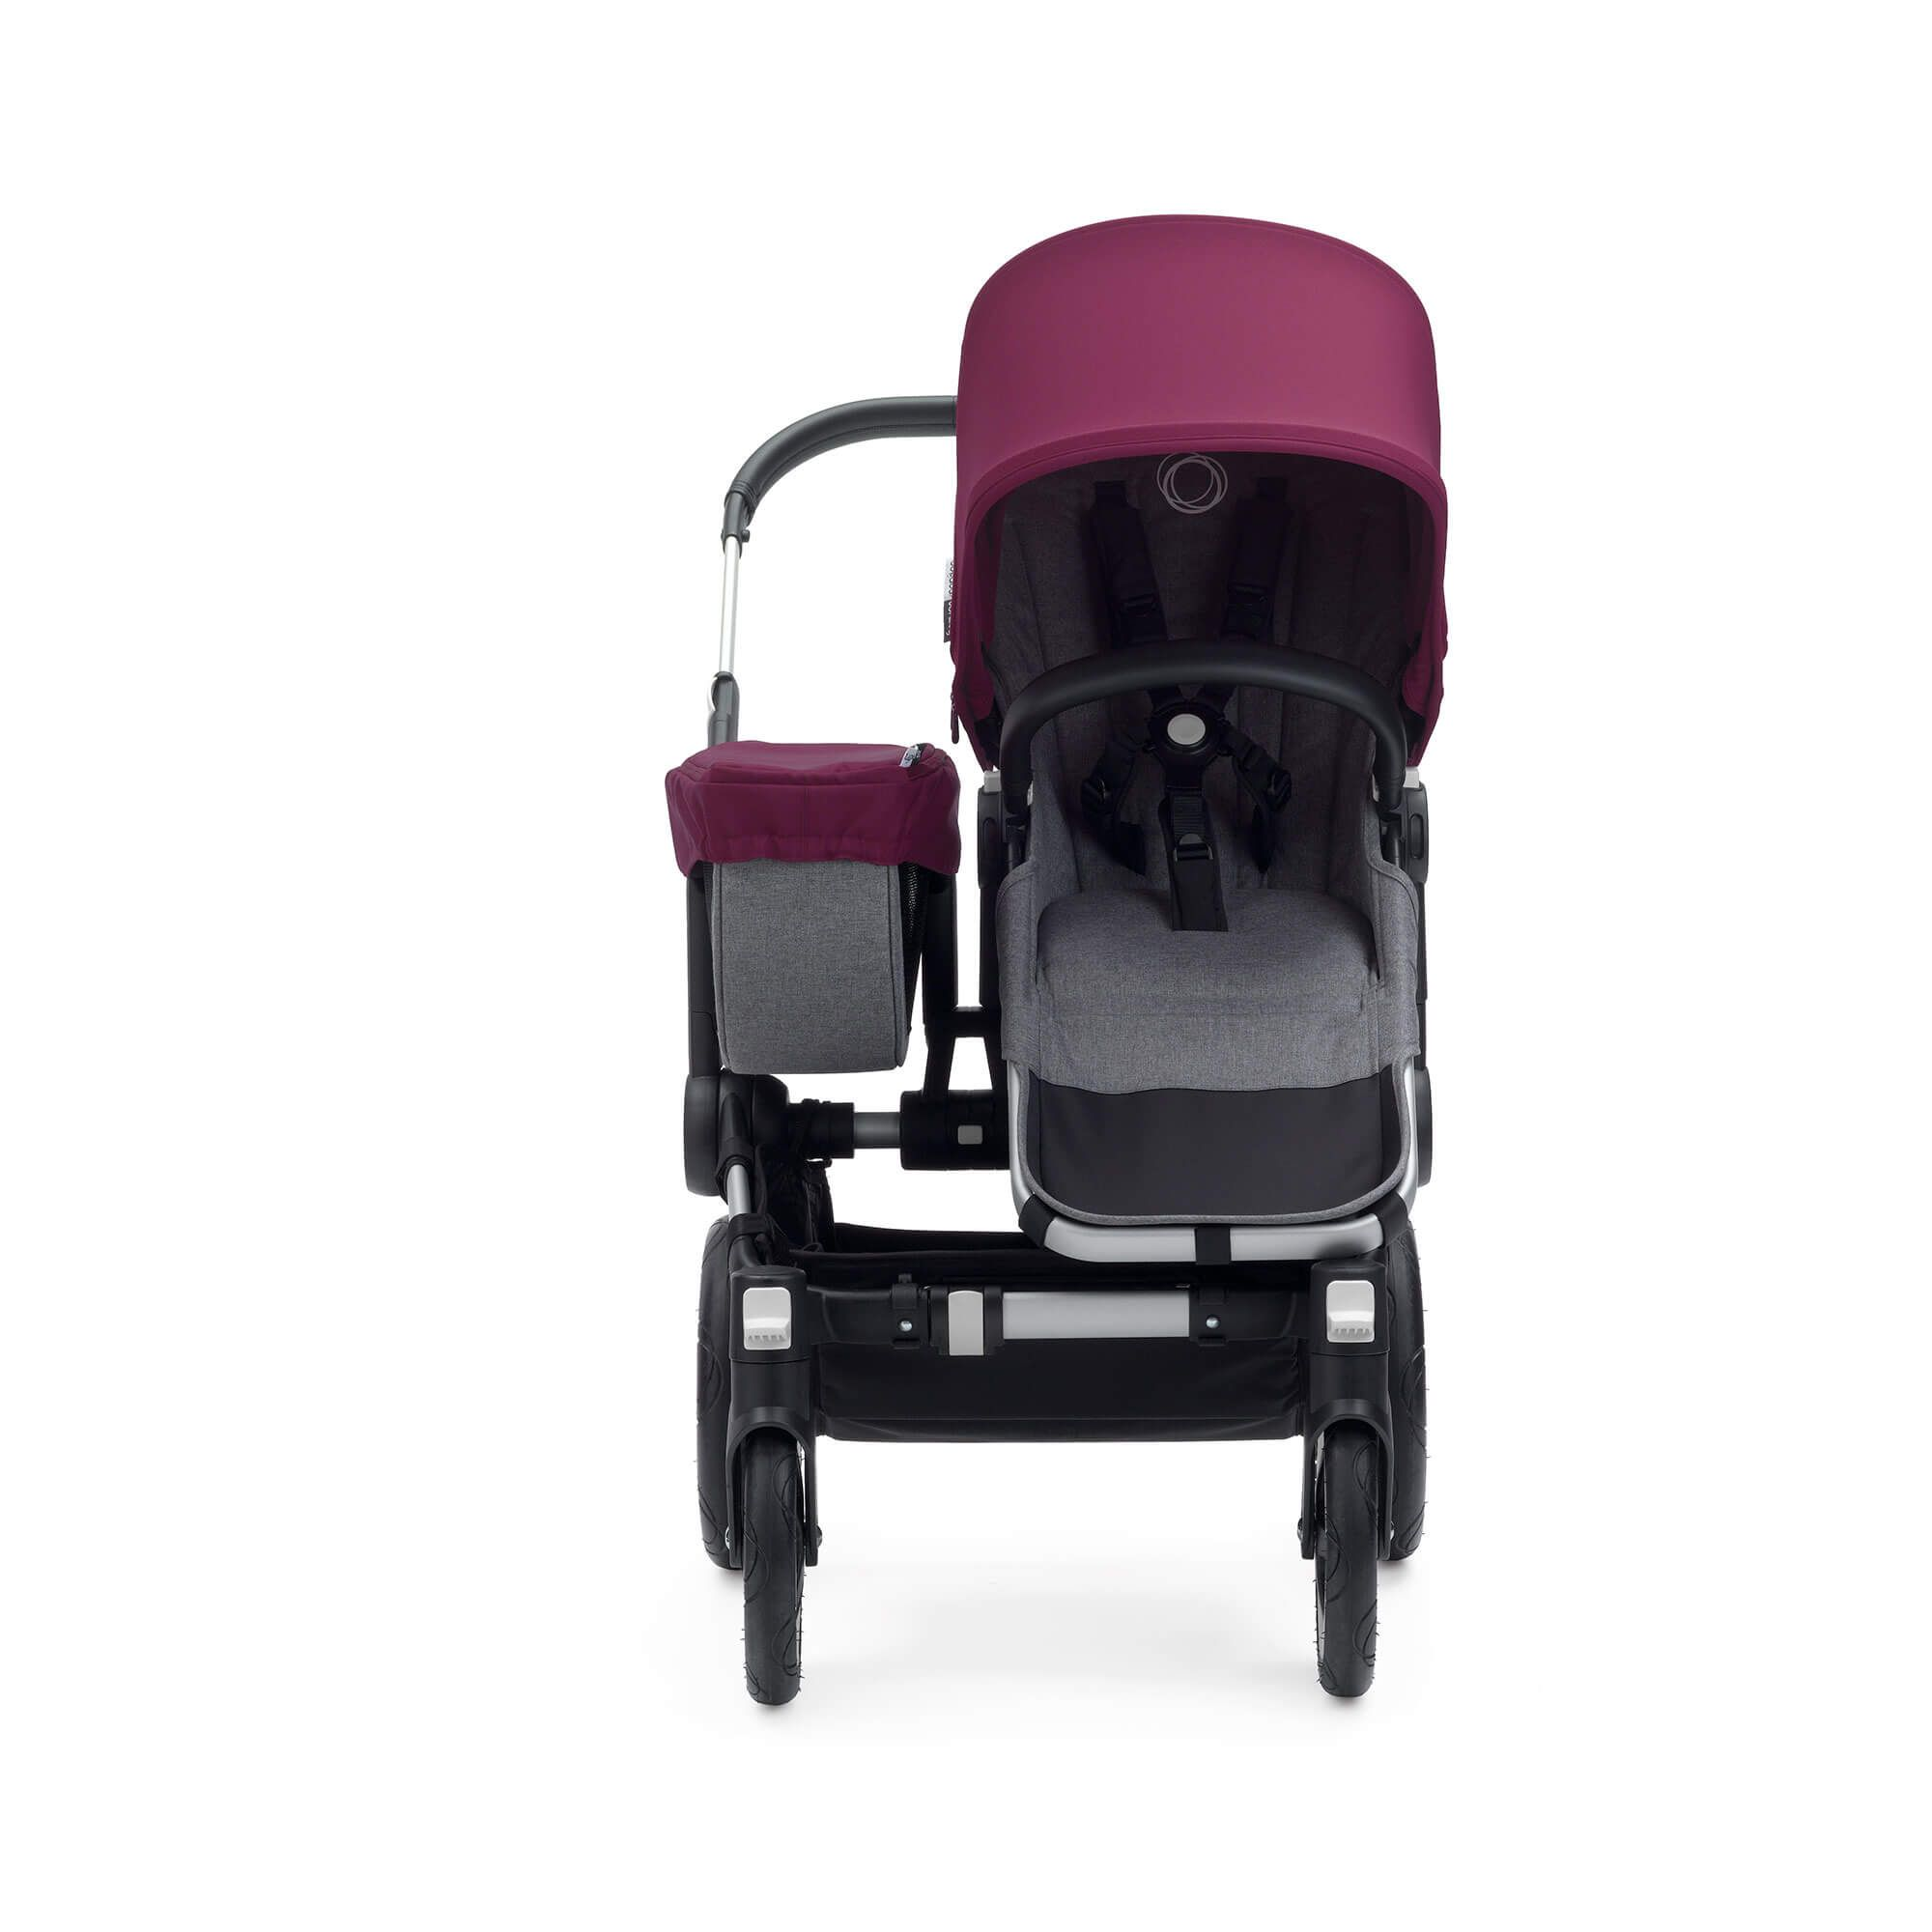 Bugaboo Donkey² The multipurpose stroller (con immagini